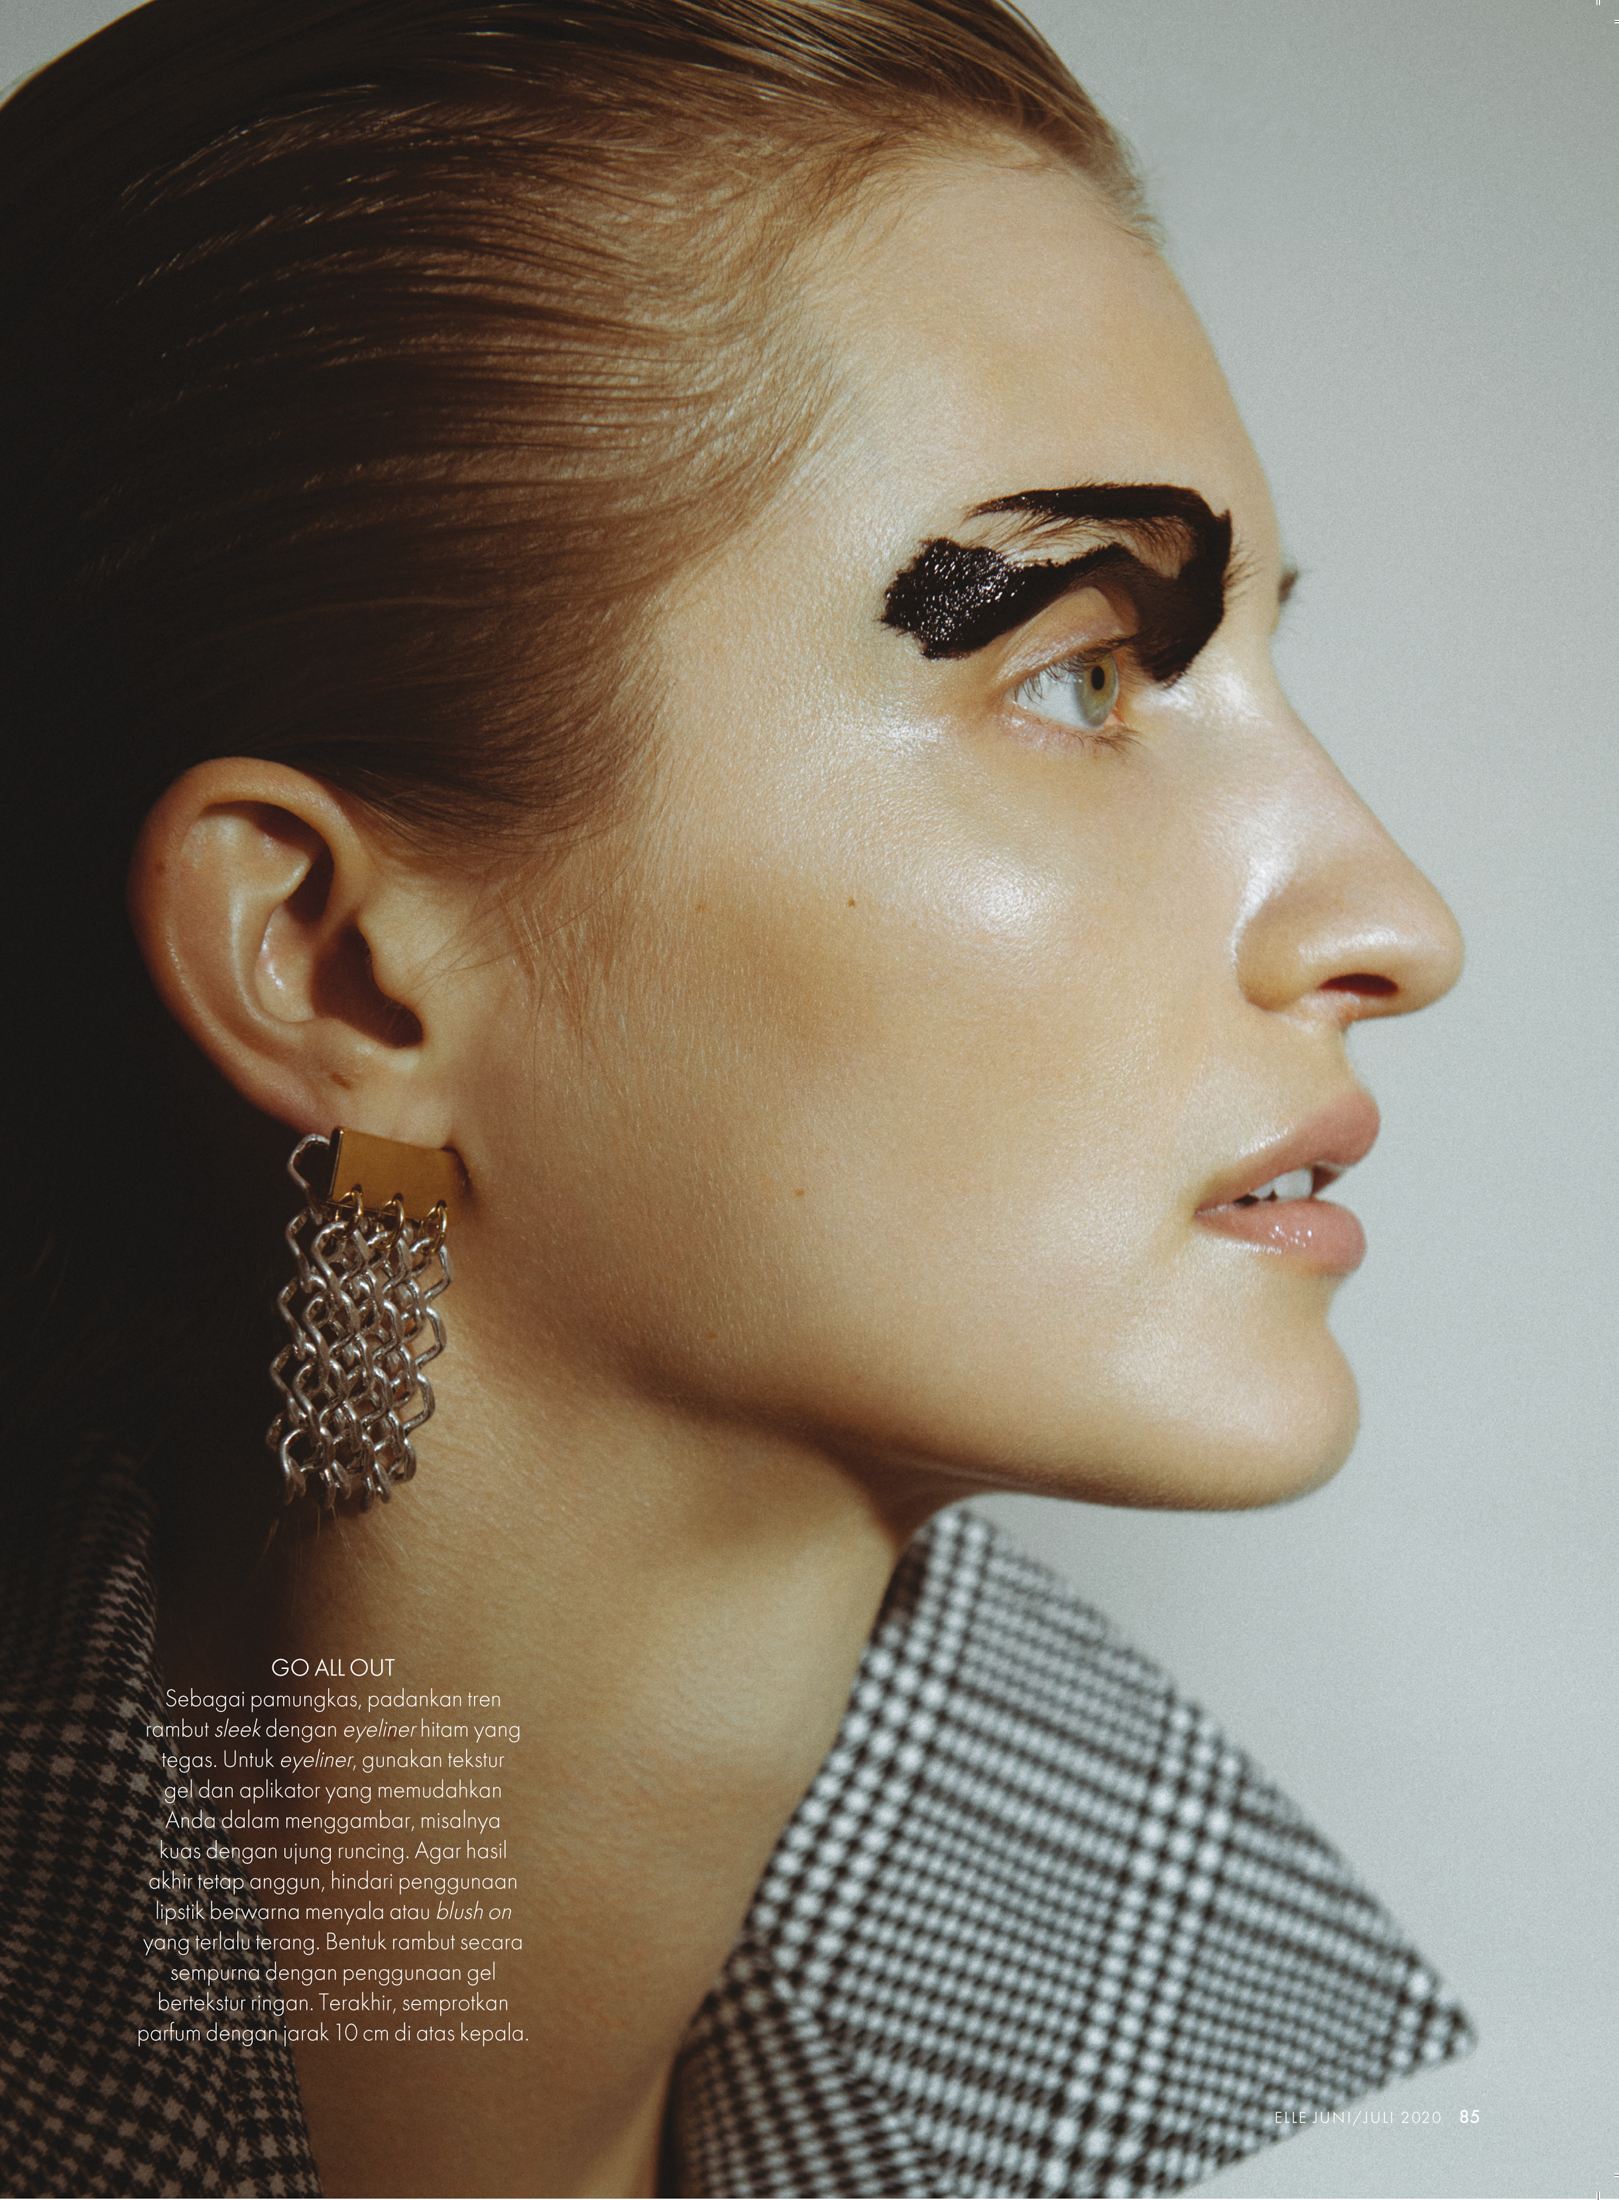 Elle Indonesia Christoph Klutsch Vermilion Photography